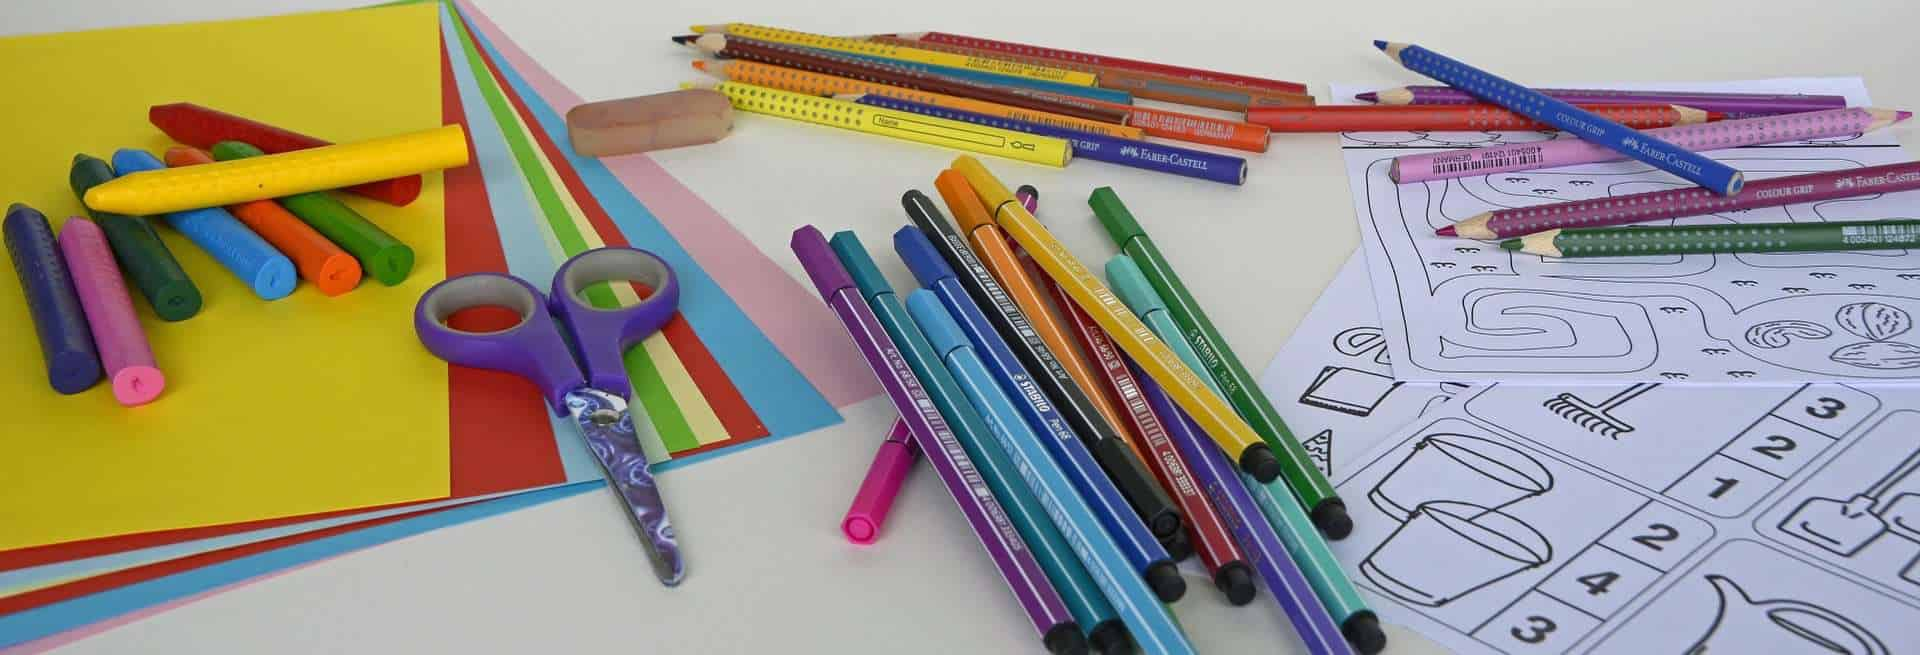 Organizing School & Art Supplies Sweet Humble Home